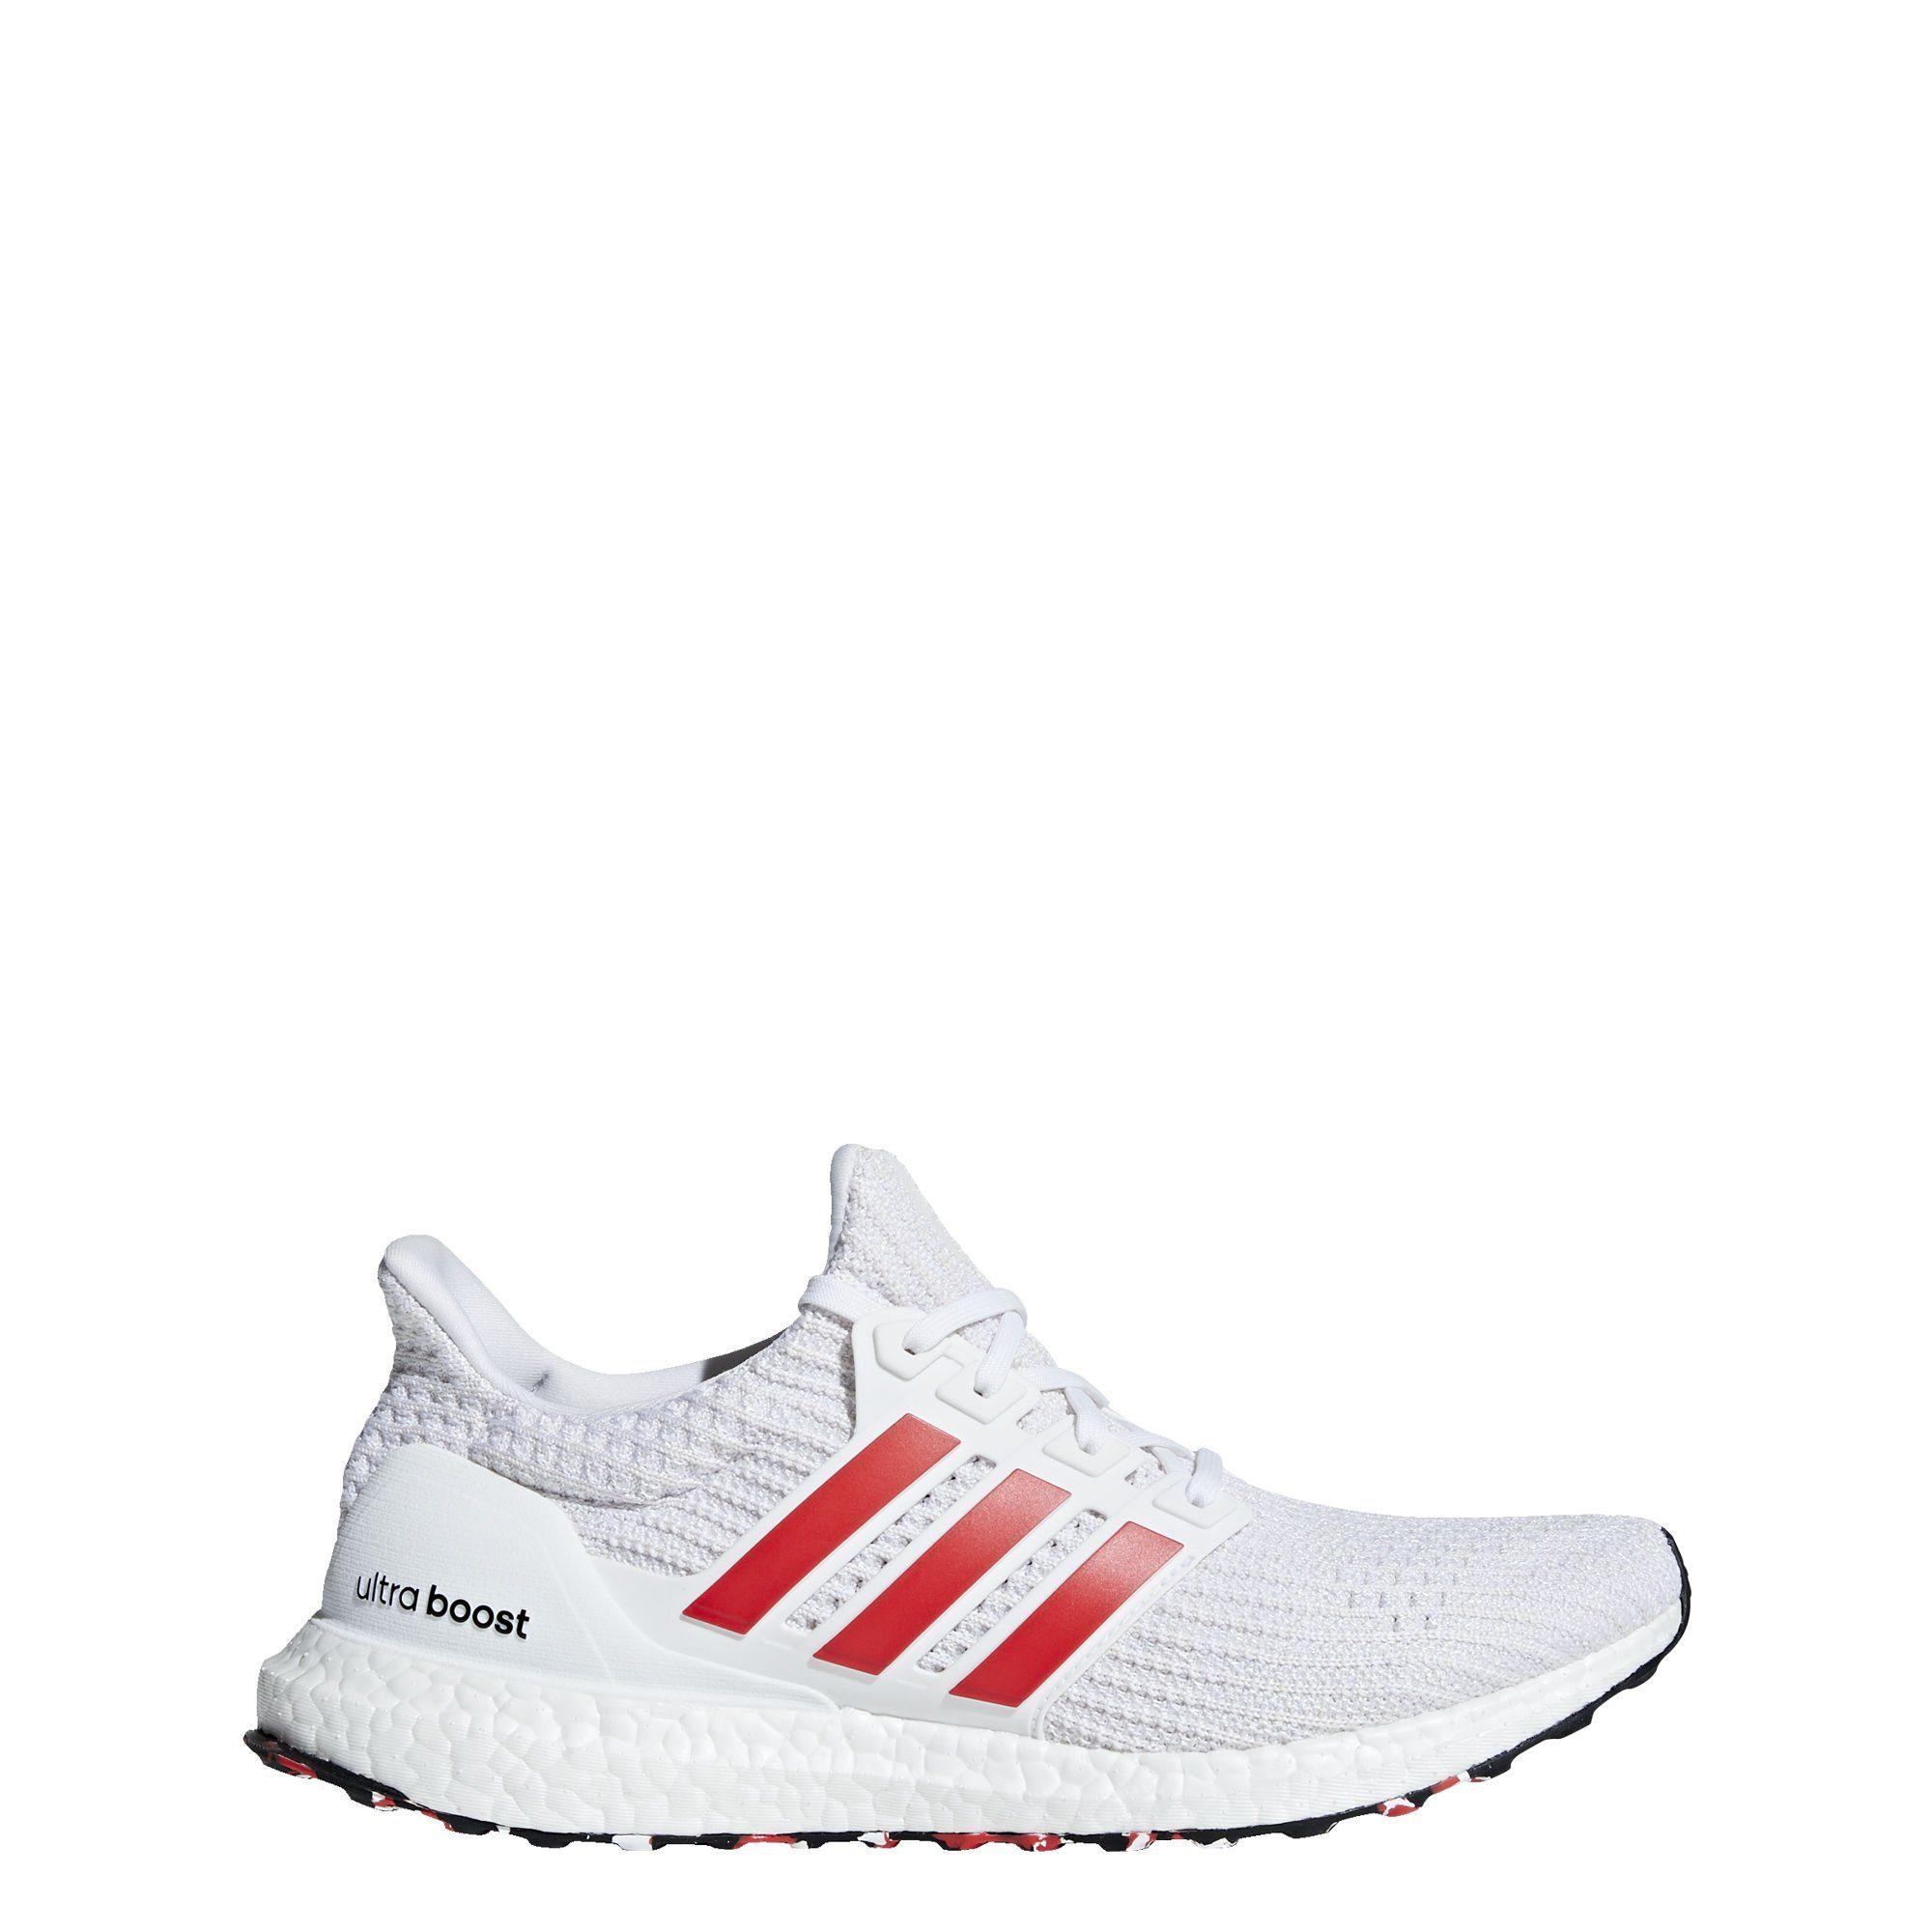 adidas Performance »UltraBOOST Schuh« Laufschuh UltraBoost online kaufen | OTTO